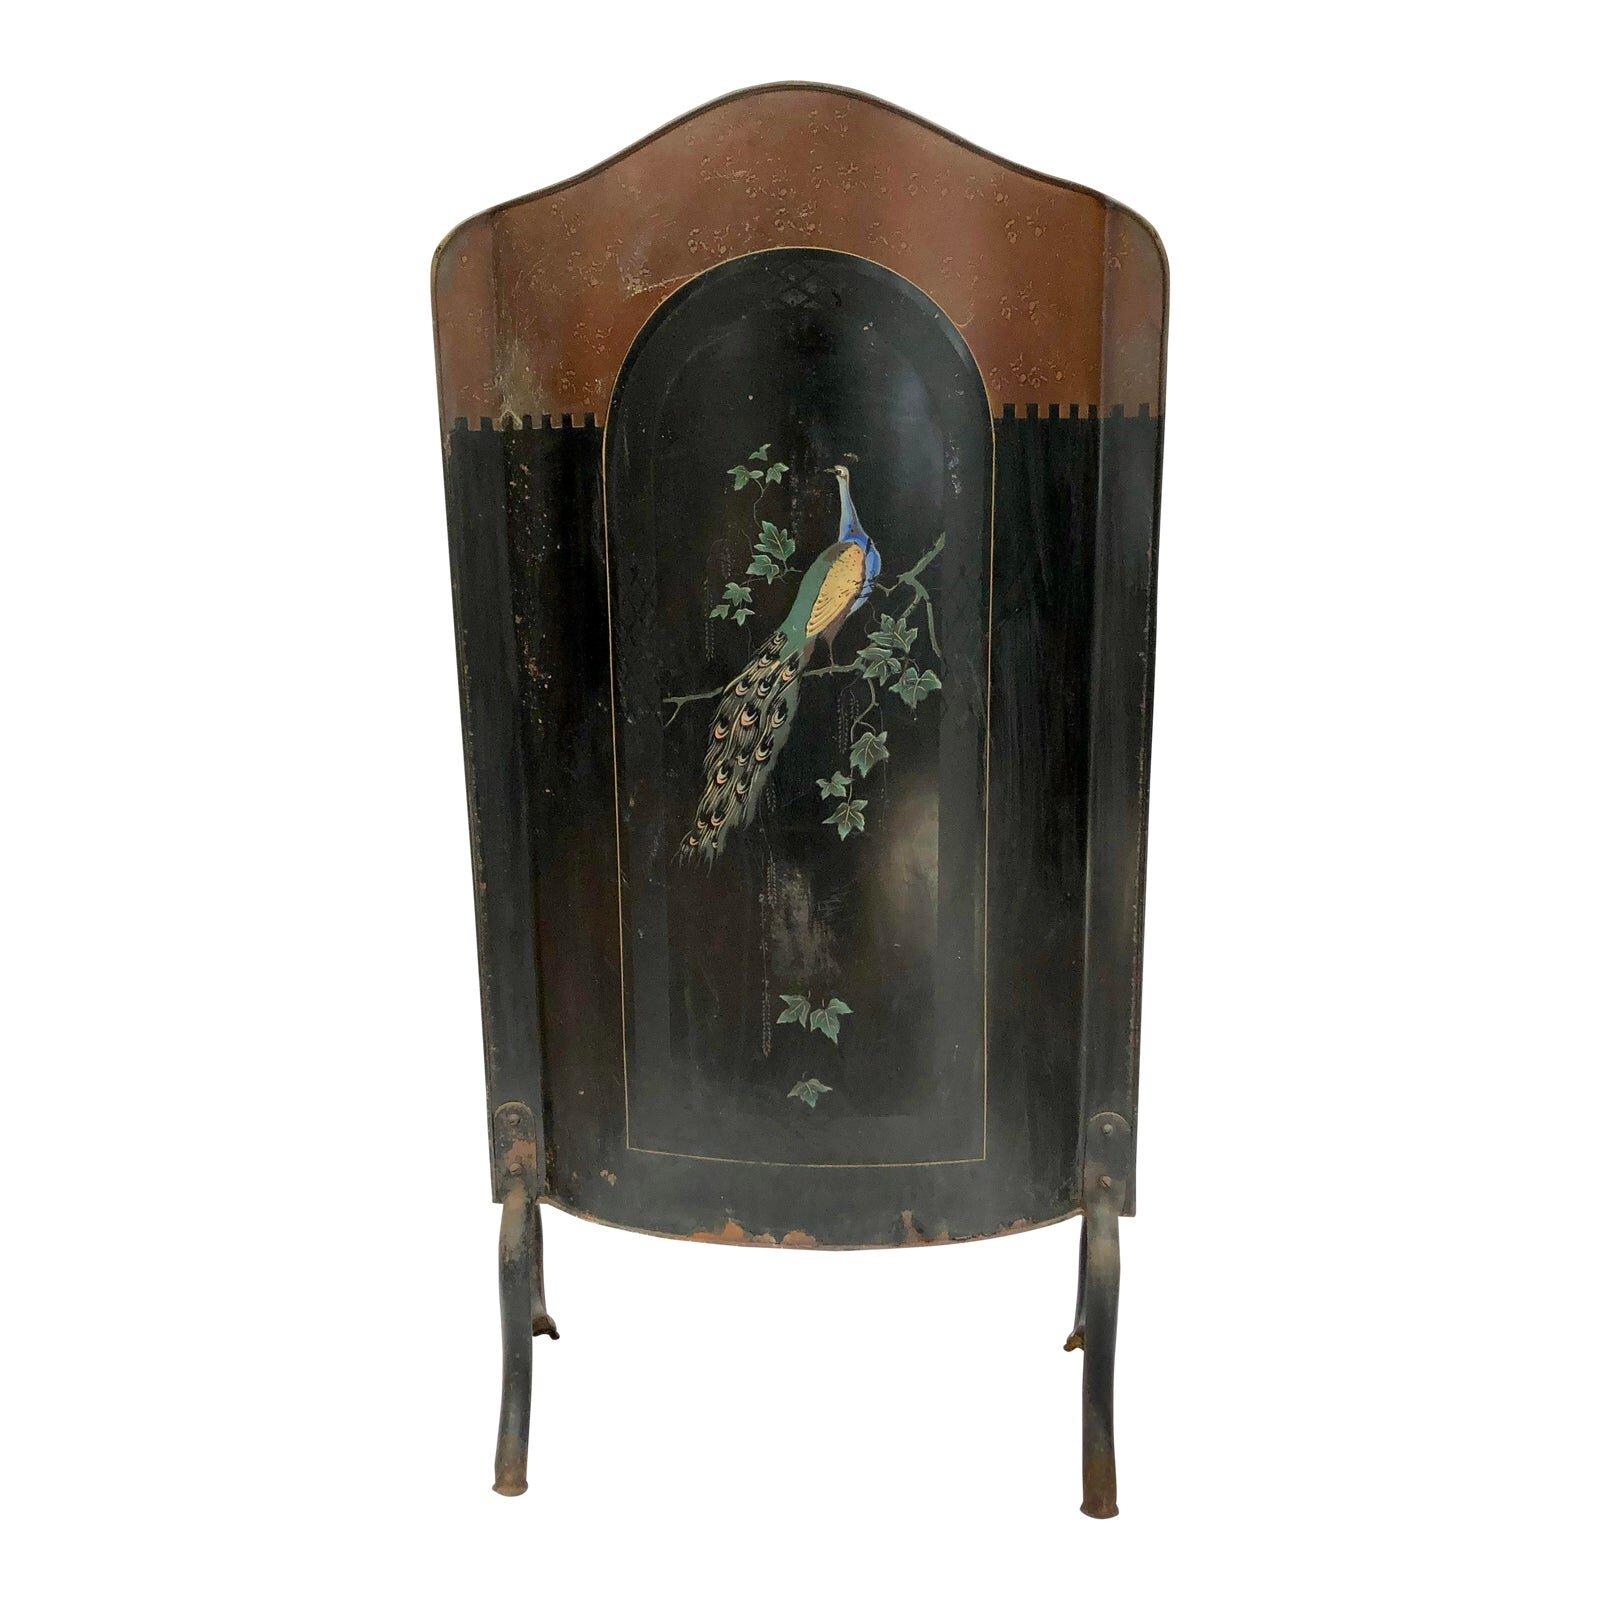 1940s-vintage-belgian-hand-painted-fireplace-screen-6862.jpeg